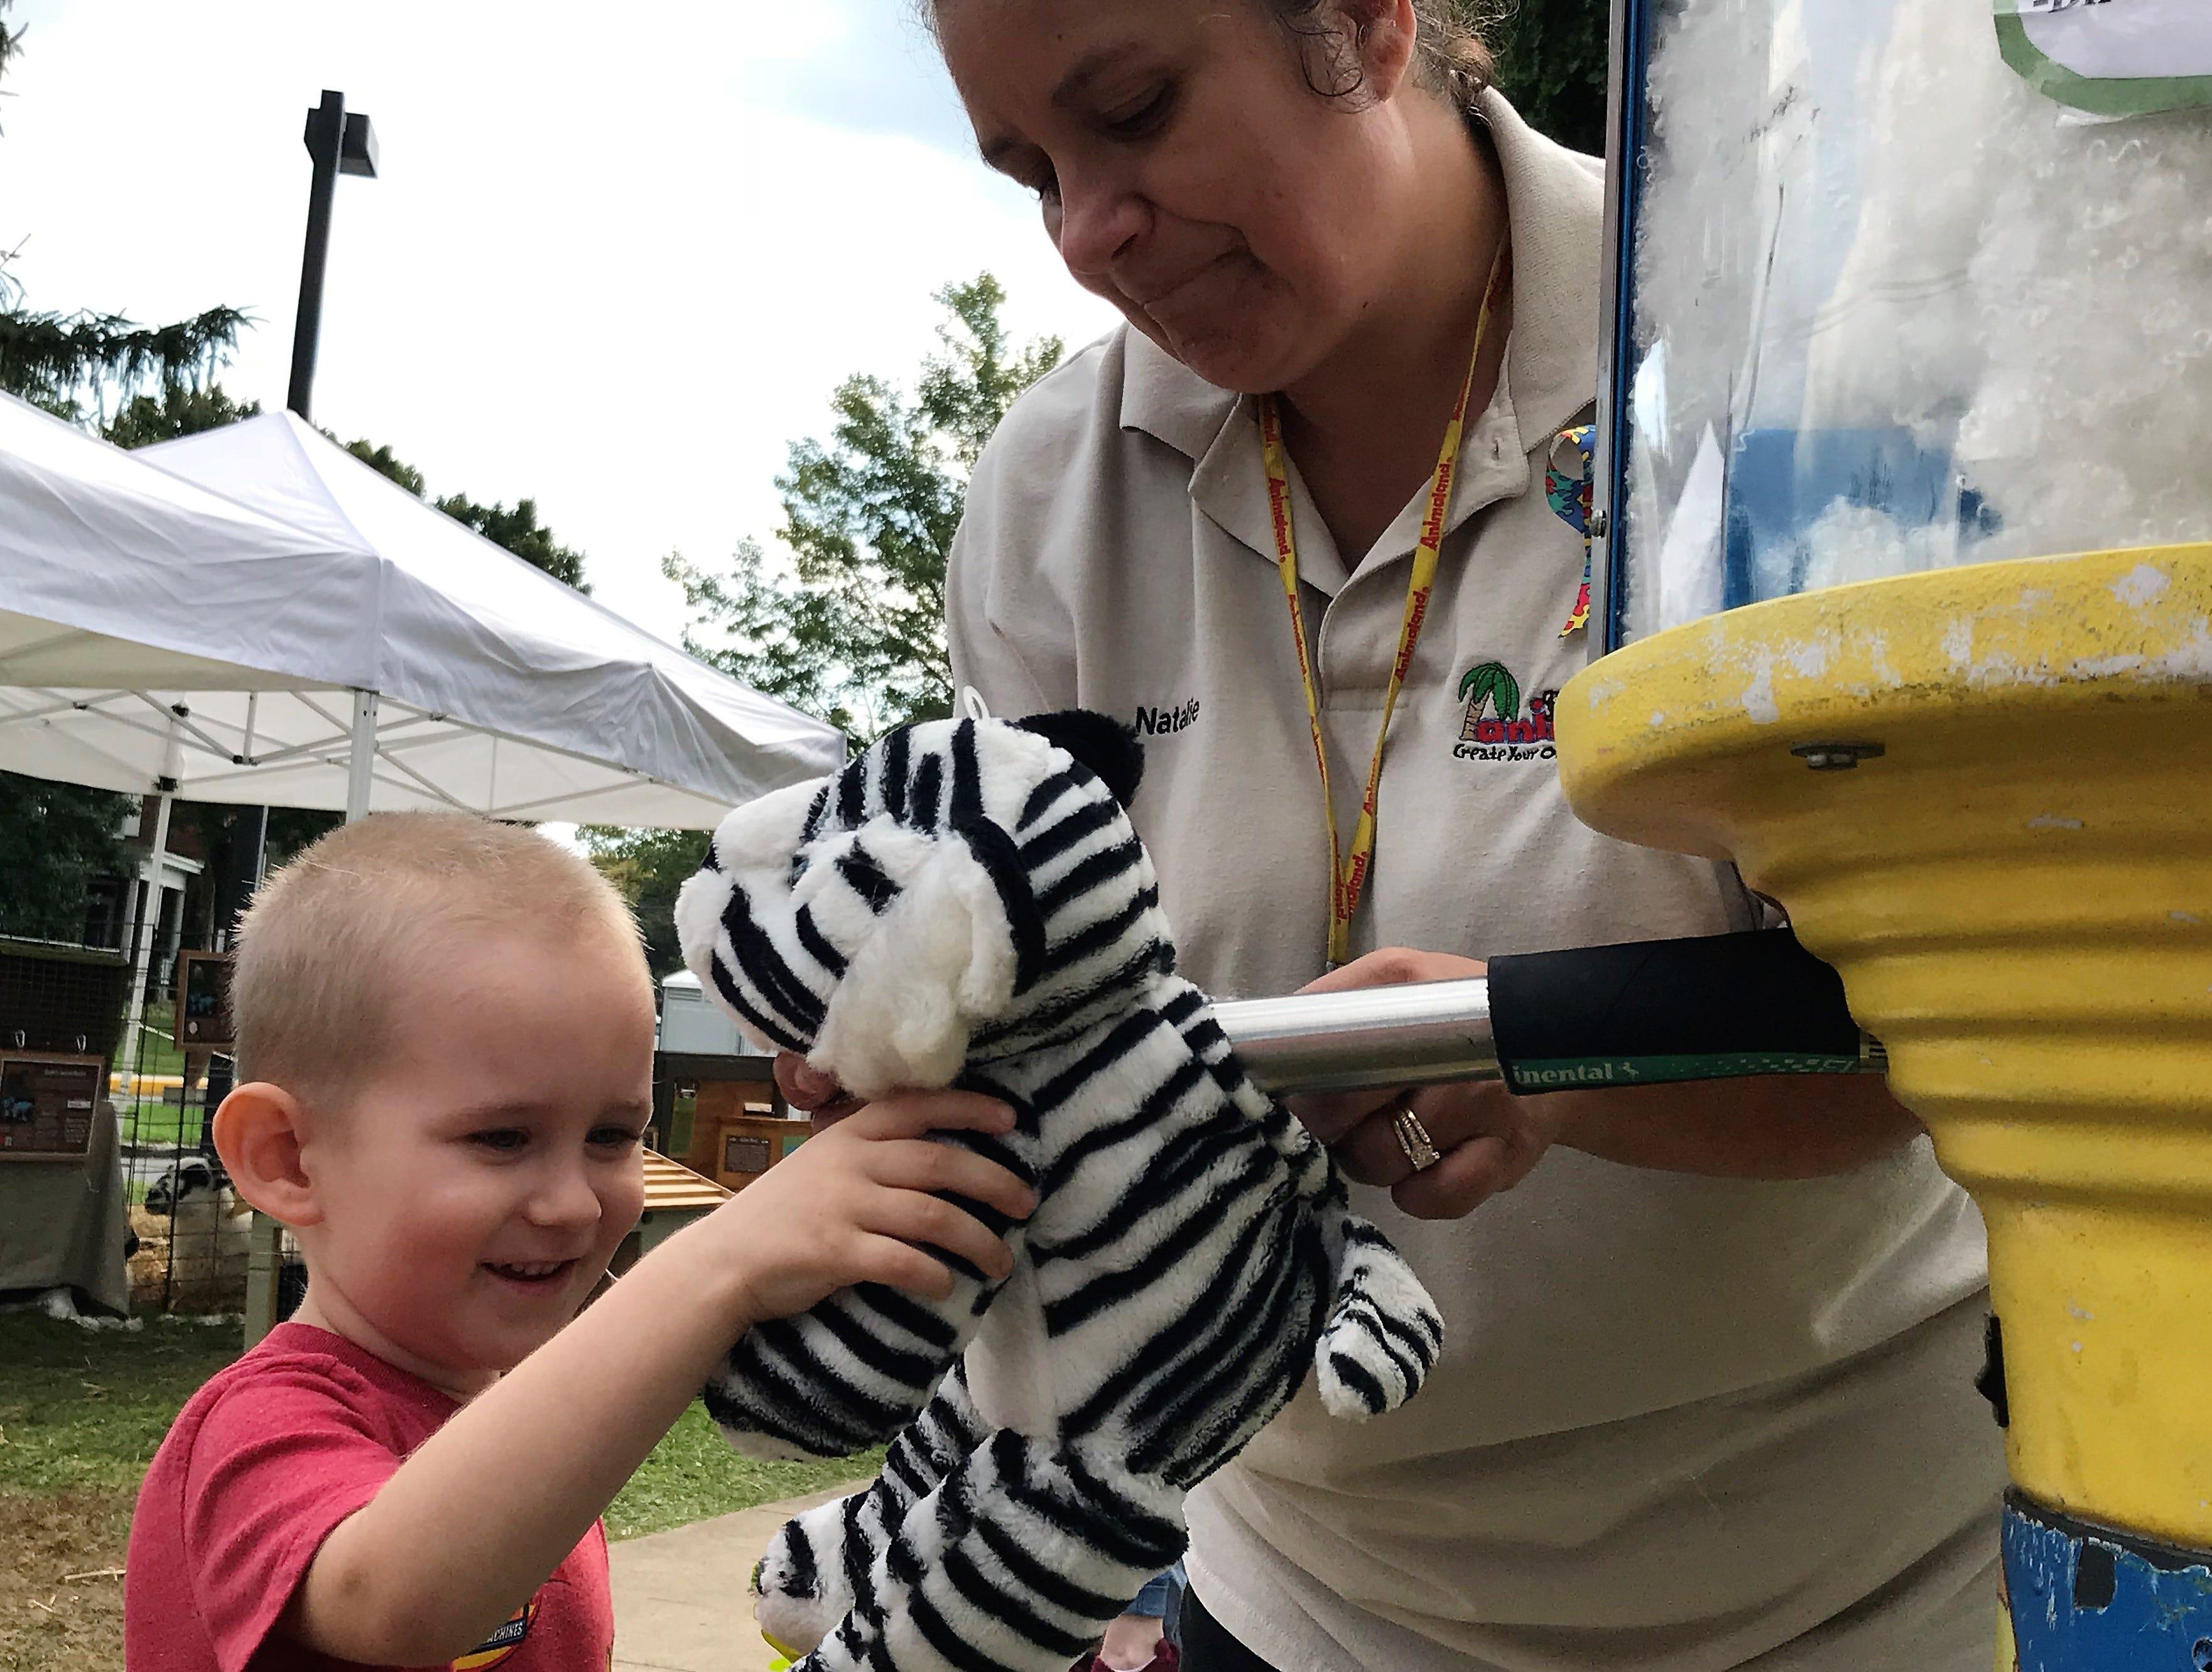 Quinntin Oberholzer, 4, Mercersburg, makes a stuffed animal on Saturday, Sept. 29, 2018, at Mercersburg Townfest.